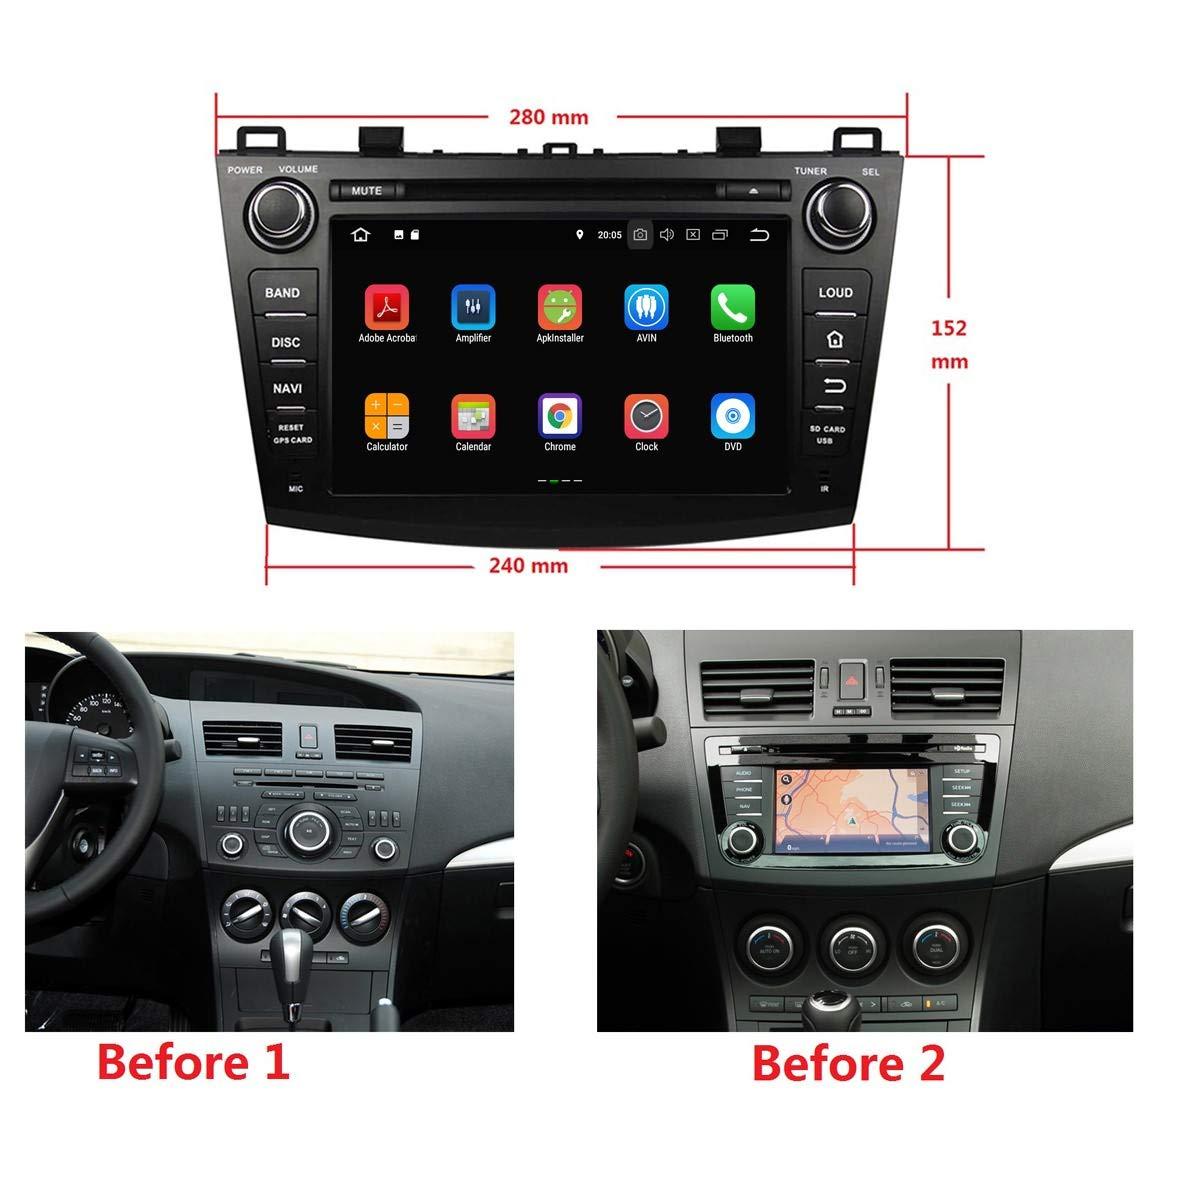 8 Pulgadas 2 DIN Coche Radio Android 8.1 OS para Mazda 3 2010 2011 2012 2013,Dab+ Radio 1024x600 Pantalla Táctil Capacitiva con Quad Core 1.5G CPU 16G Flash ...